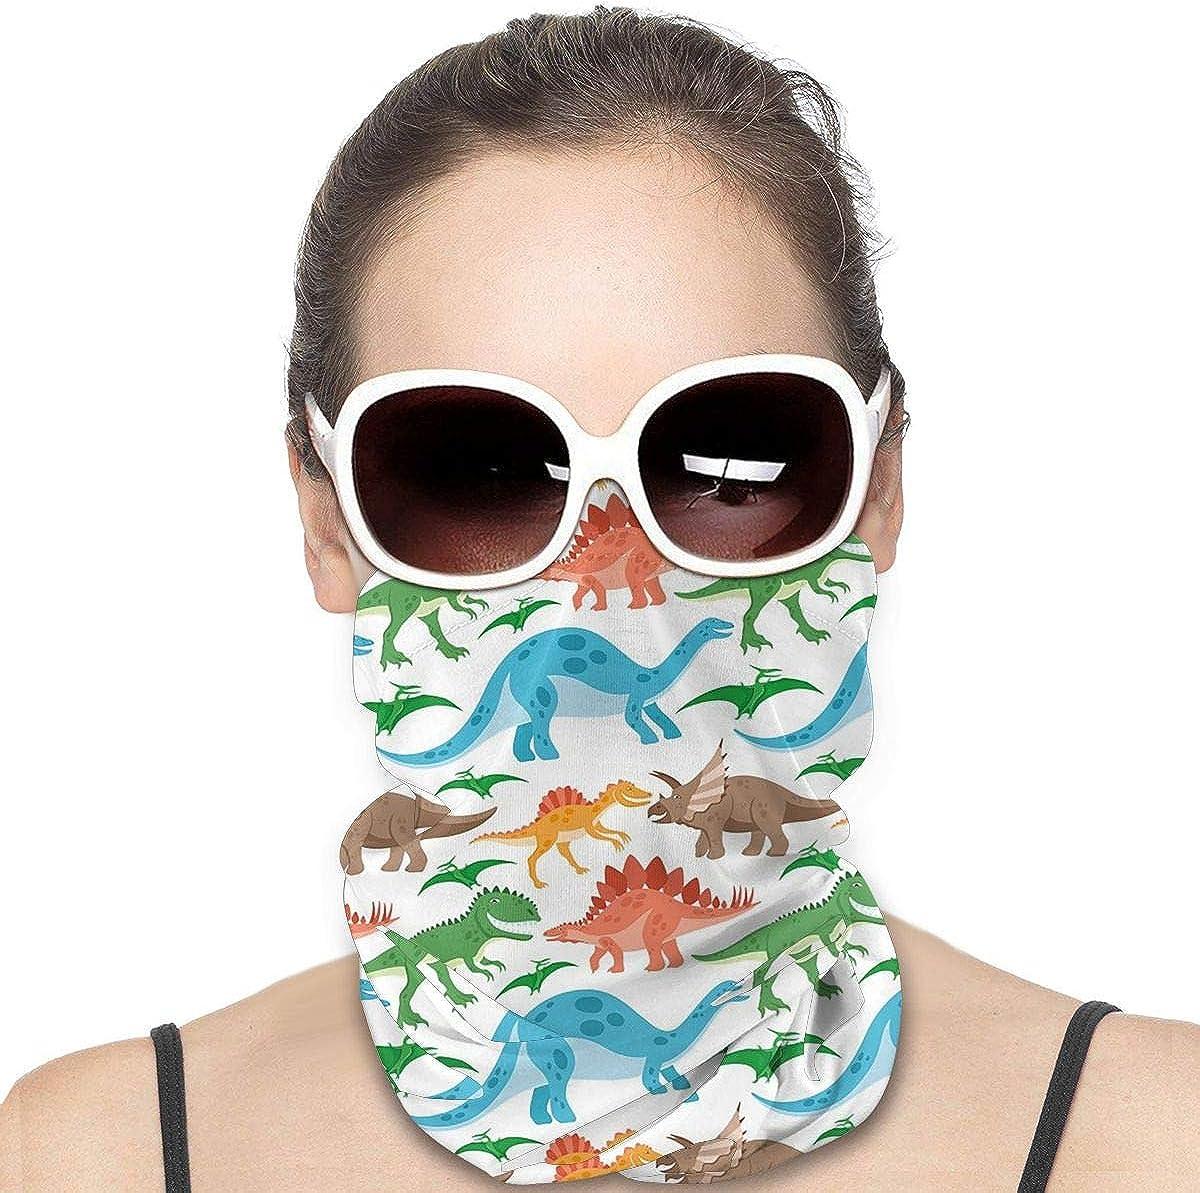 KiuLoam Women Bandanas Face Mask, Colorful Dinosaurs Animal Neck Gaiter Mask Headband for Men Face Scarf Dust, Outdoors, Sports